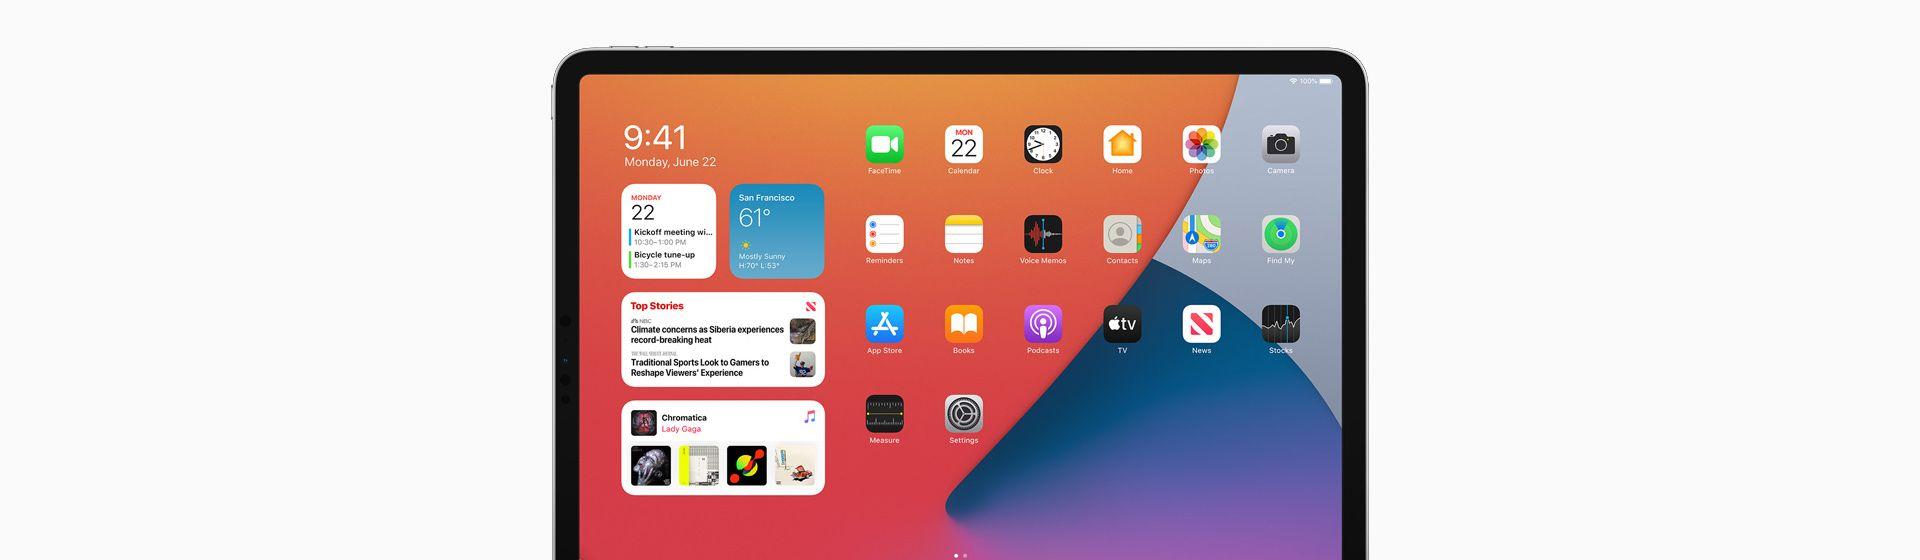 iPadOS 14: conheça os novos recursos do sistema para tablets da Apple